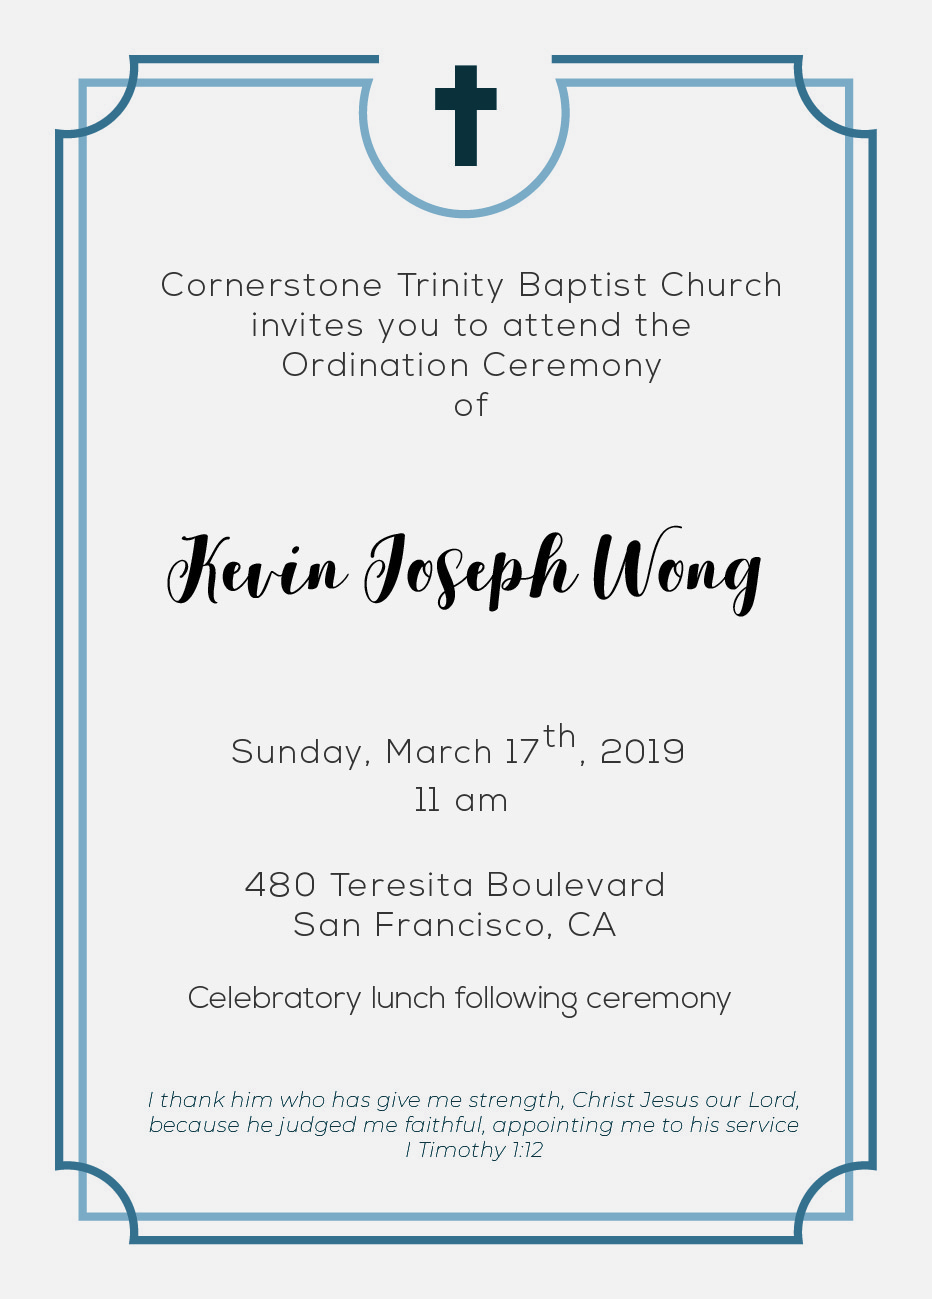 Pastor Kevin's Ordination Ceremony — Cornerstone Trinity